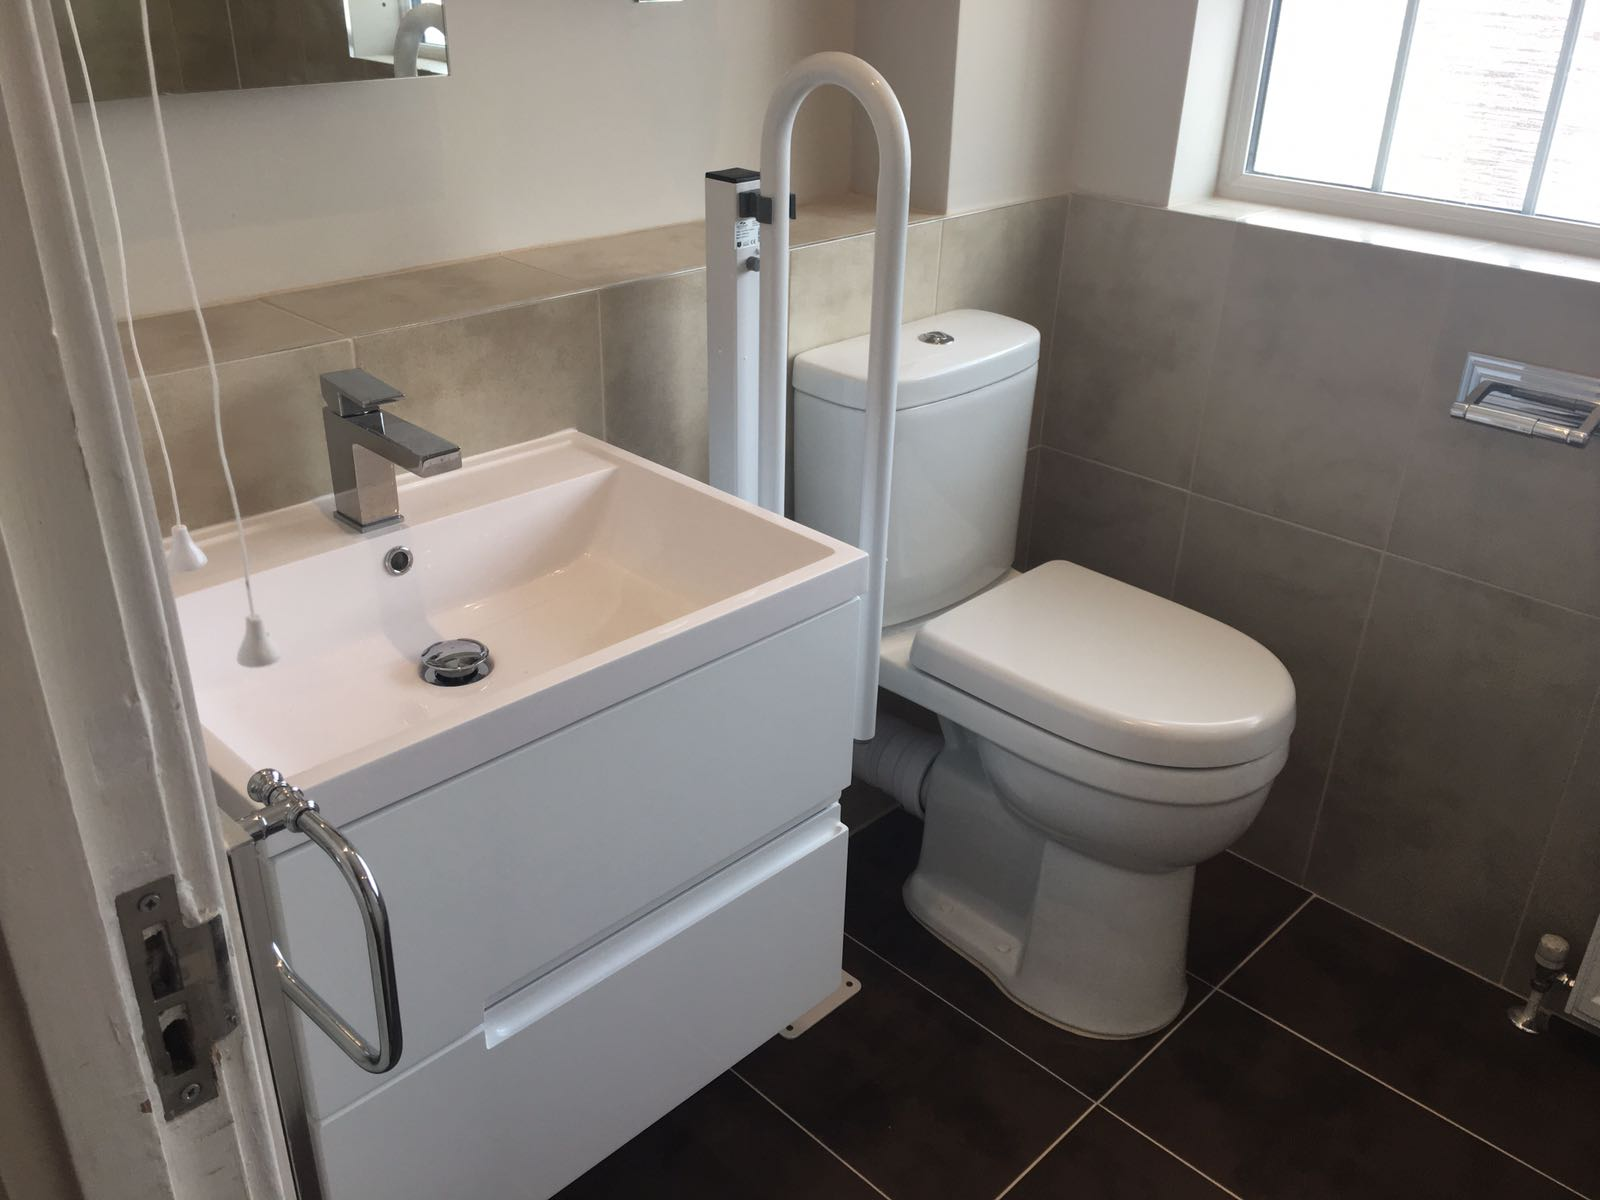 Bathroom refit cost bathroom design ideas new bathroom design ideas bathroom interior design Small bathroom cost uk